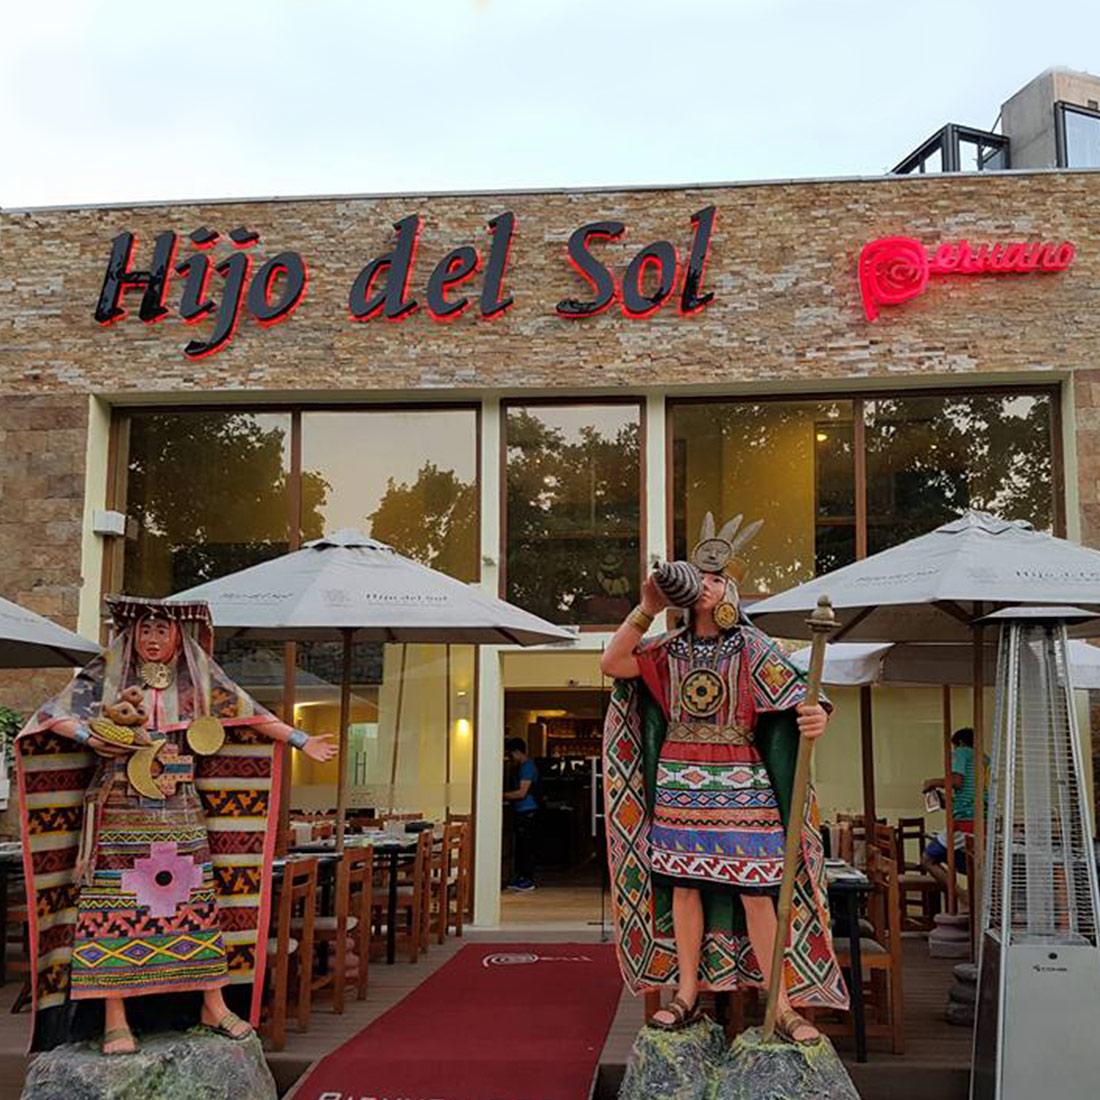 HIJO DEL SOL - VITACURA Restaurante - Reserva en restaurantes de Comida PERUANA - VITACURA - MESA 24/7 | SANTIAGO - Perú